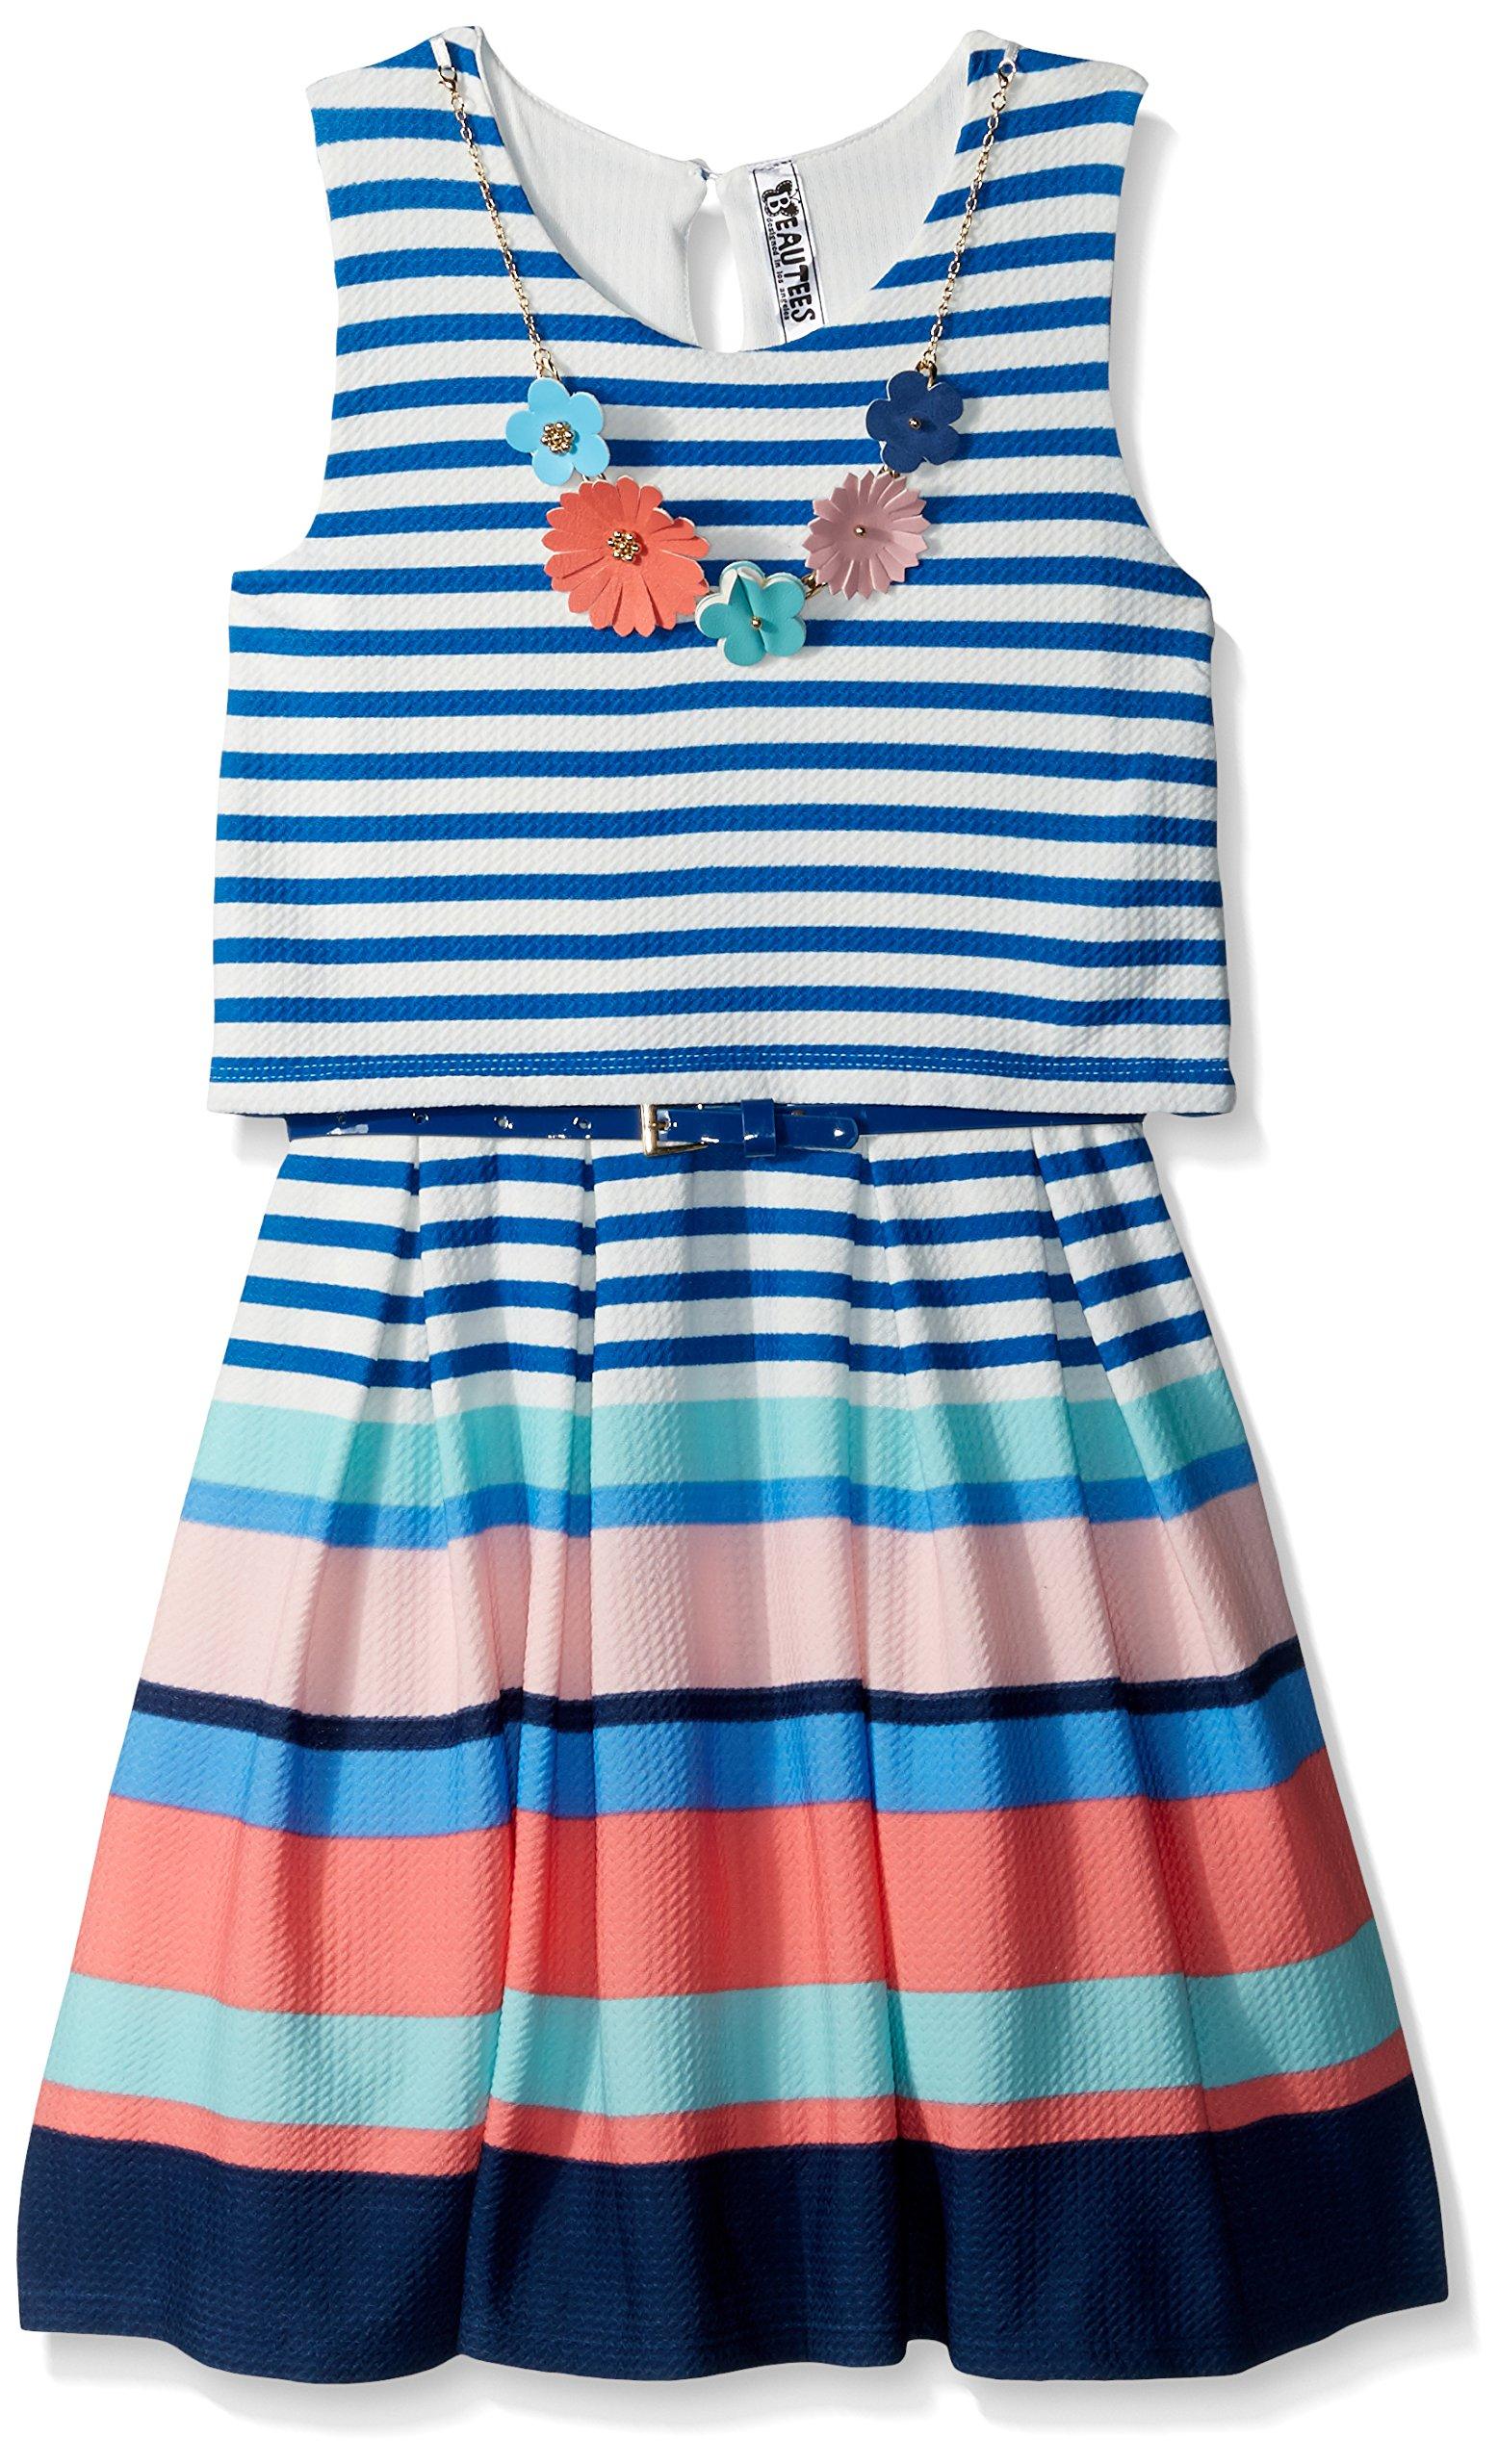 Beautees Big Girls' Sleeveless Multistripe Skater Dress, Blue, 7